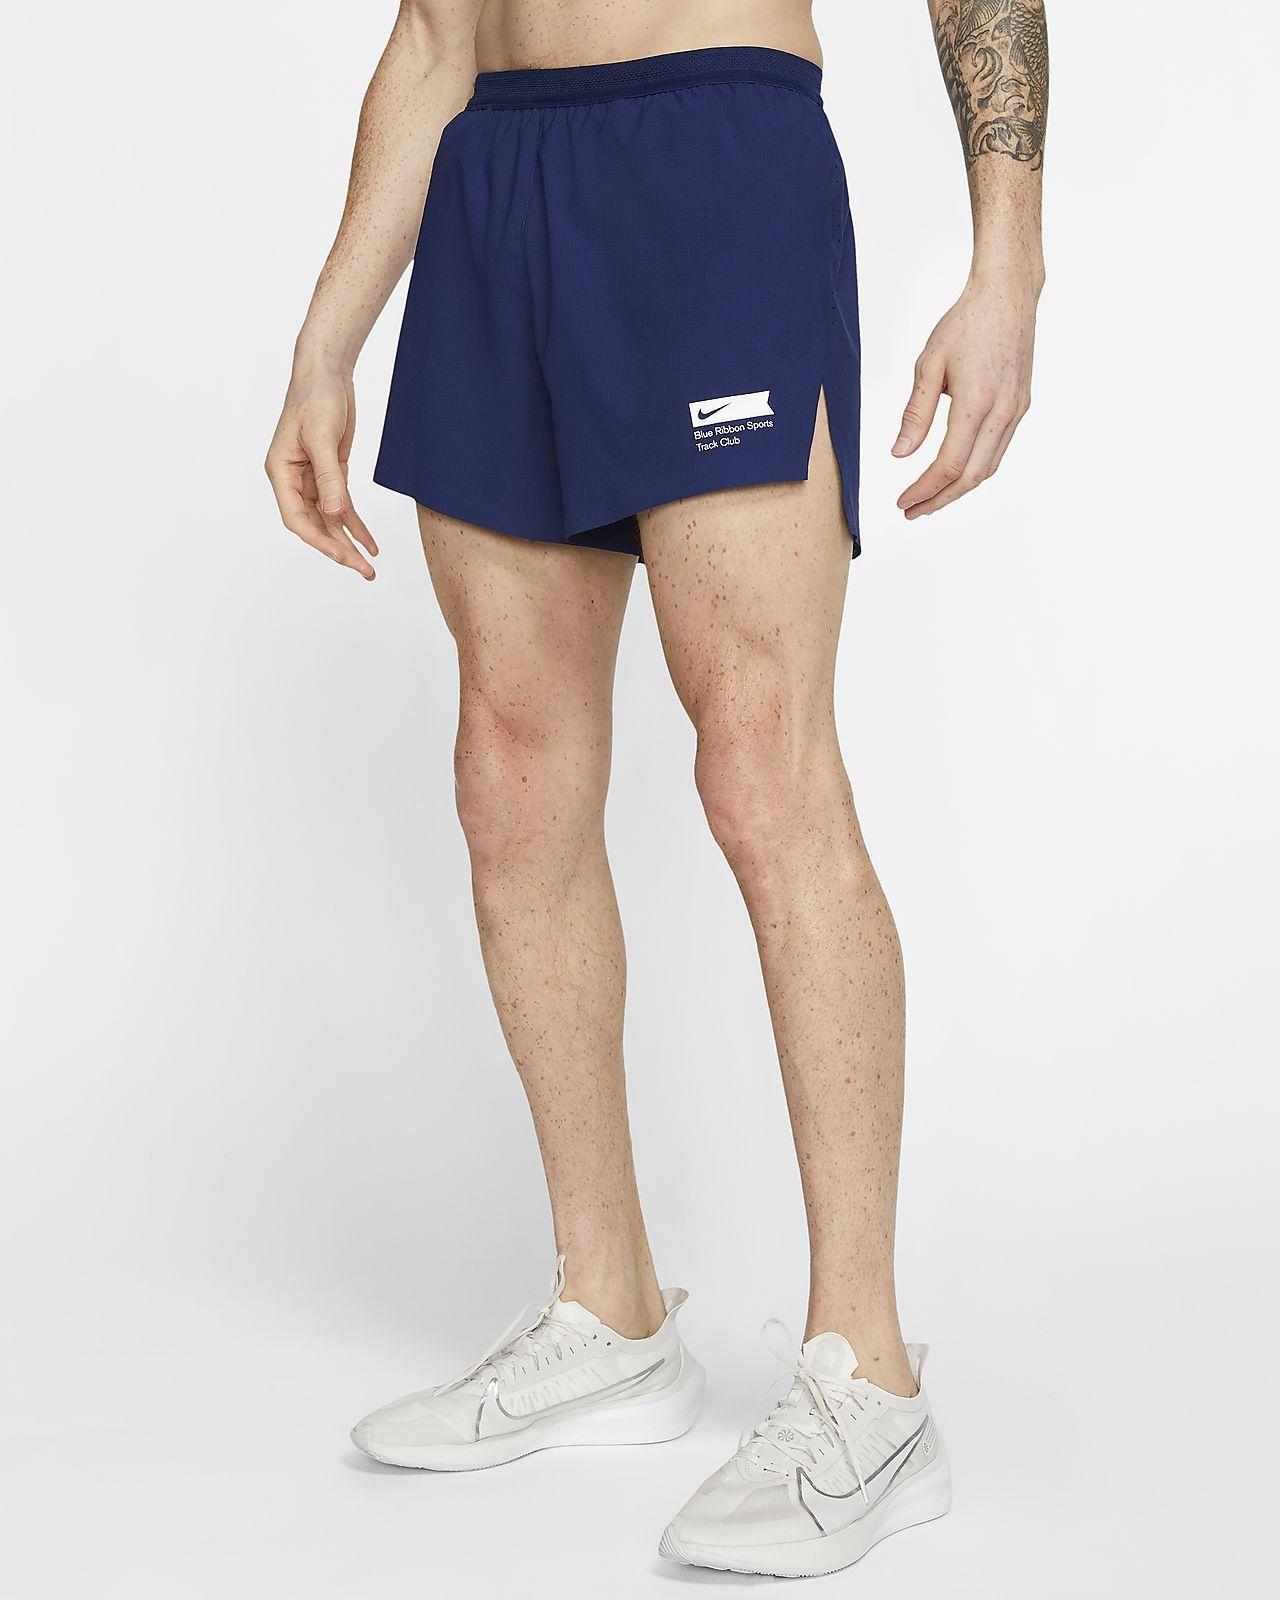 Shorts da running 11 cm Nike AeroSwift Blue Ribbon Sports